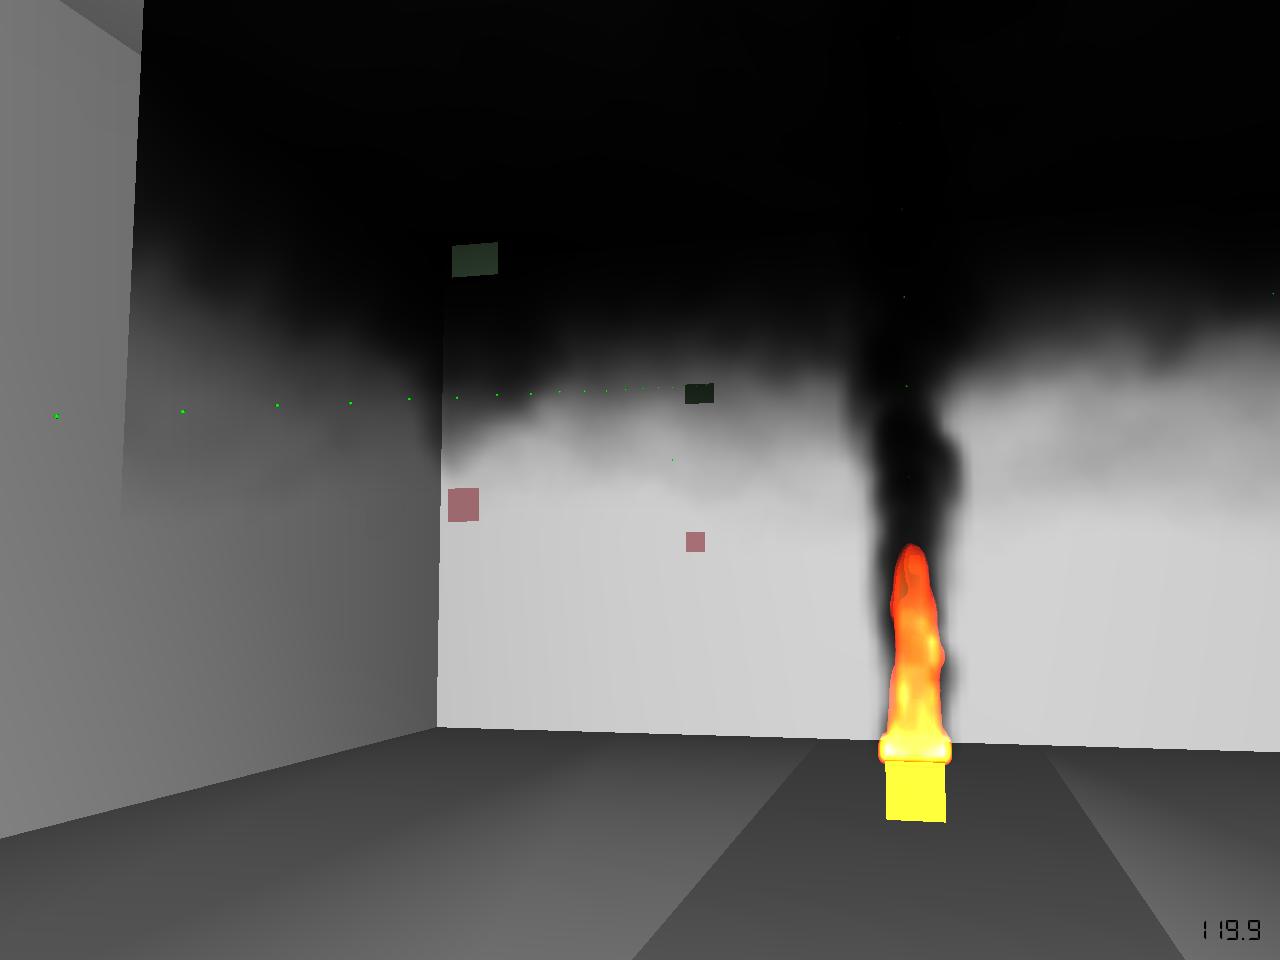 pyro scrn smokevis vtt sim 2min